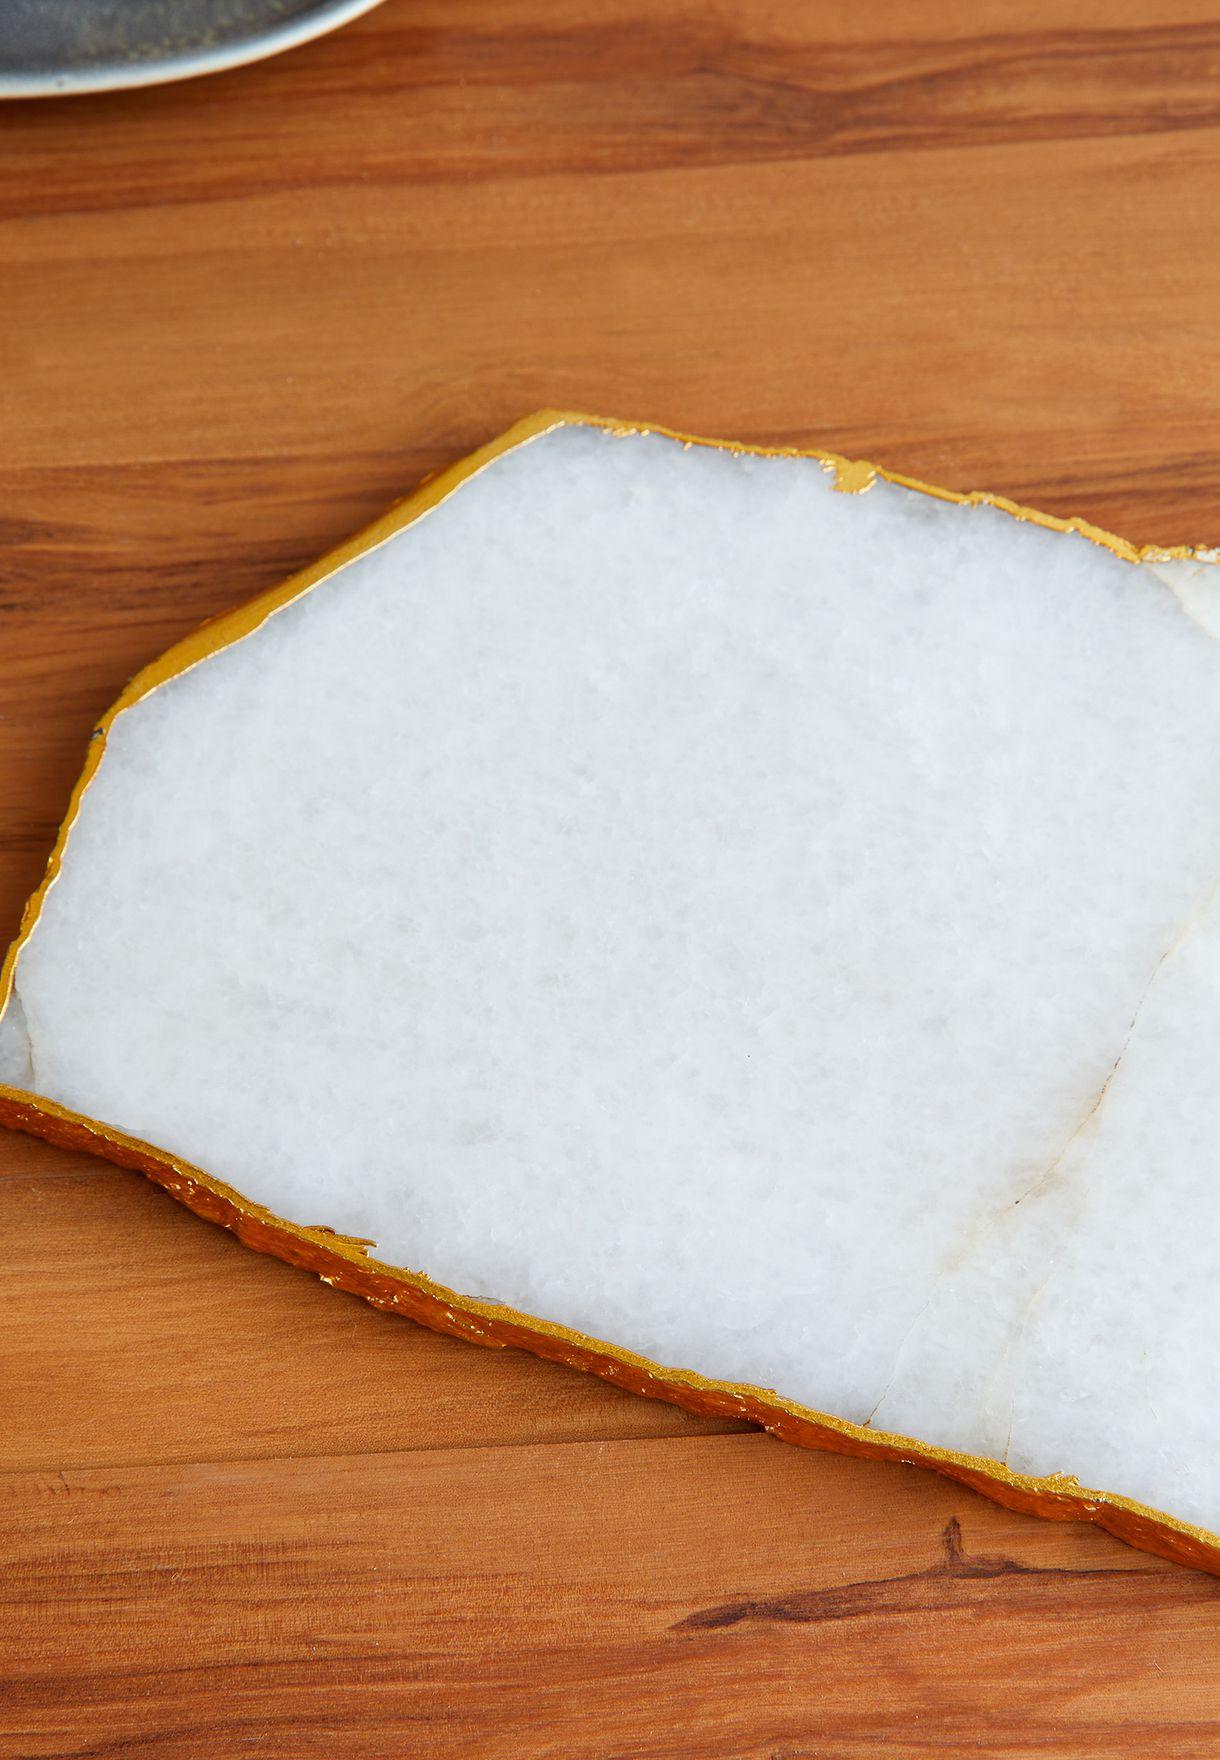 White Quartz Serving Platter With Gold Detailing